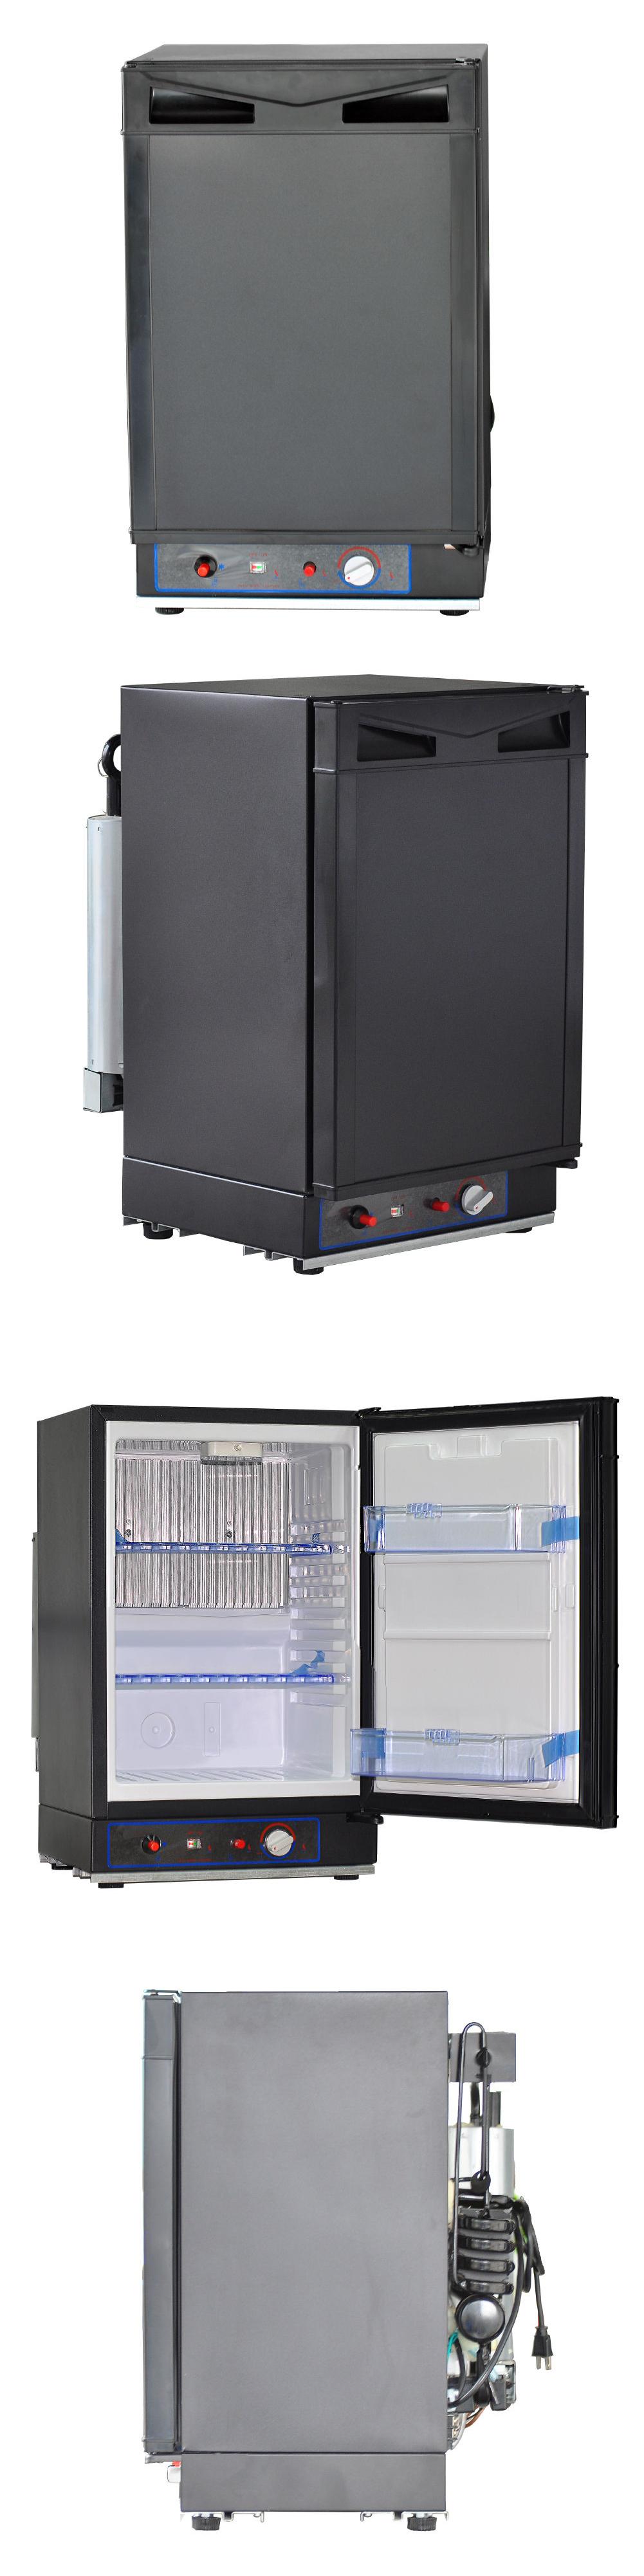 12-Volt Portable Appliances: 12V 110V Propane Refrigerator Lp Gas ...